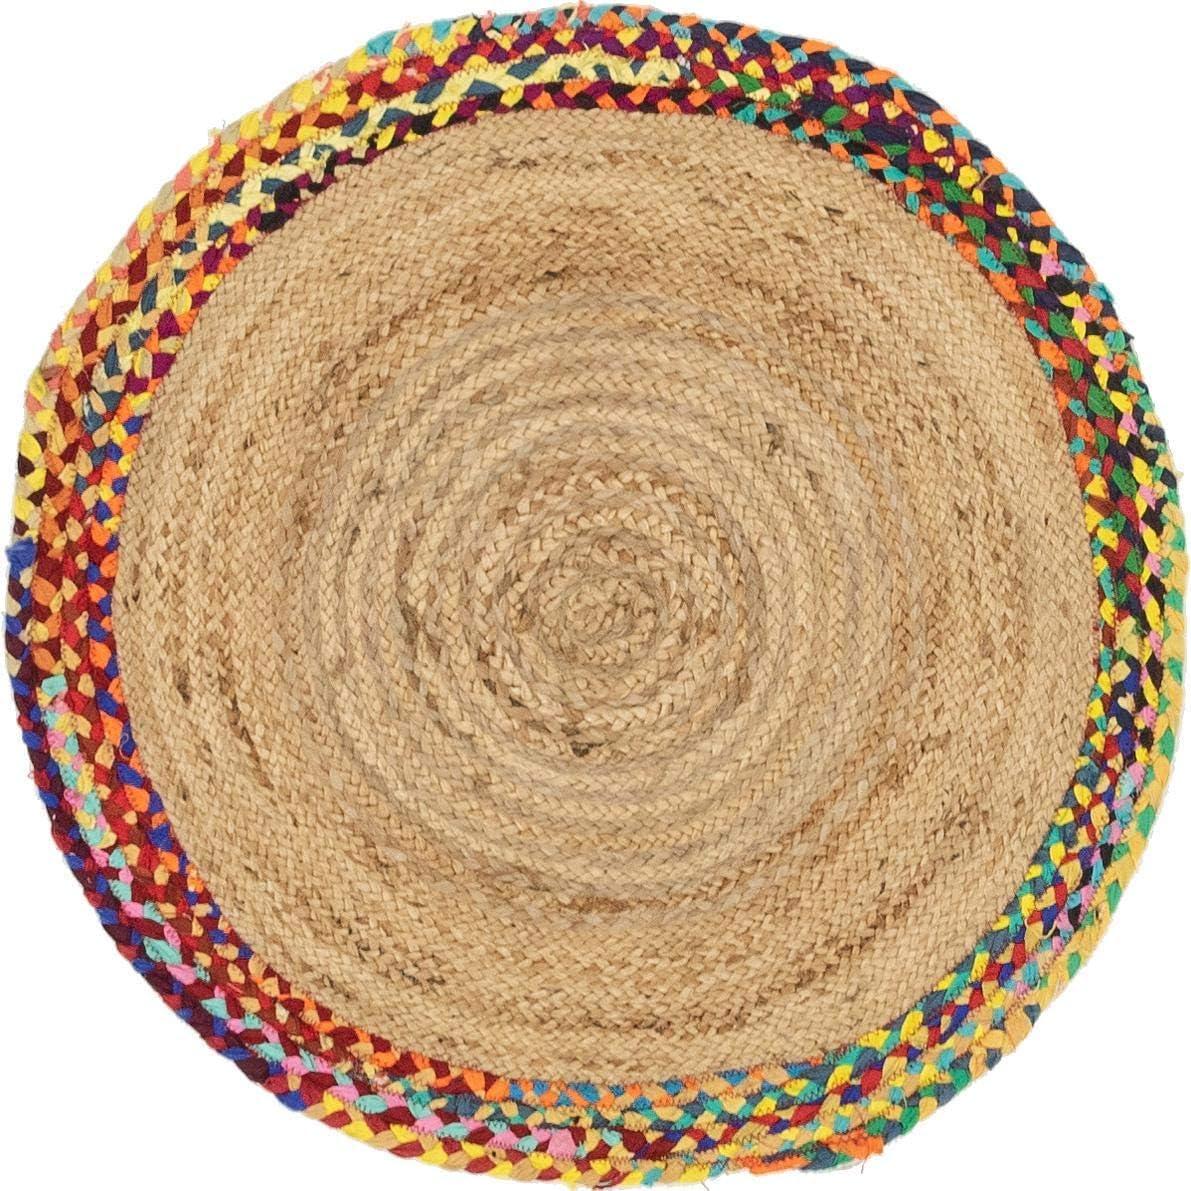 Jaipurtextilehub Alfombra Trenzada de algodón de Yute